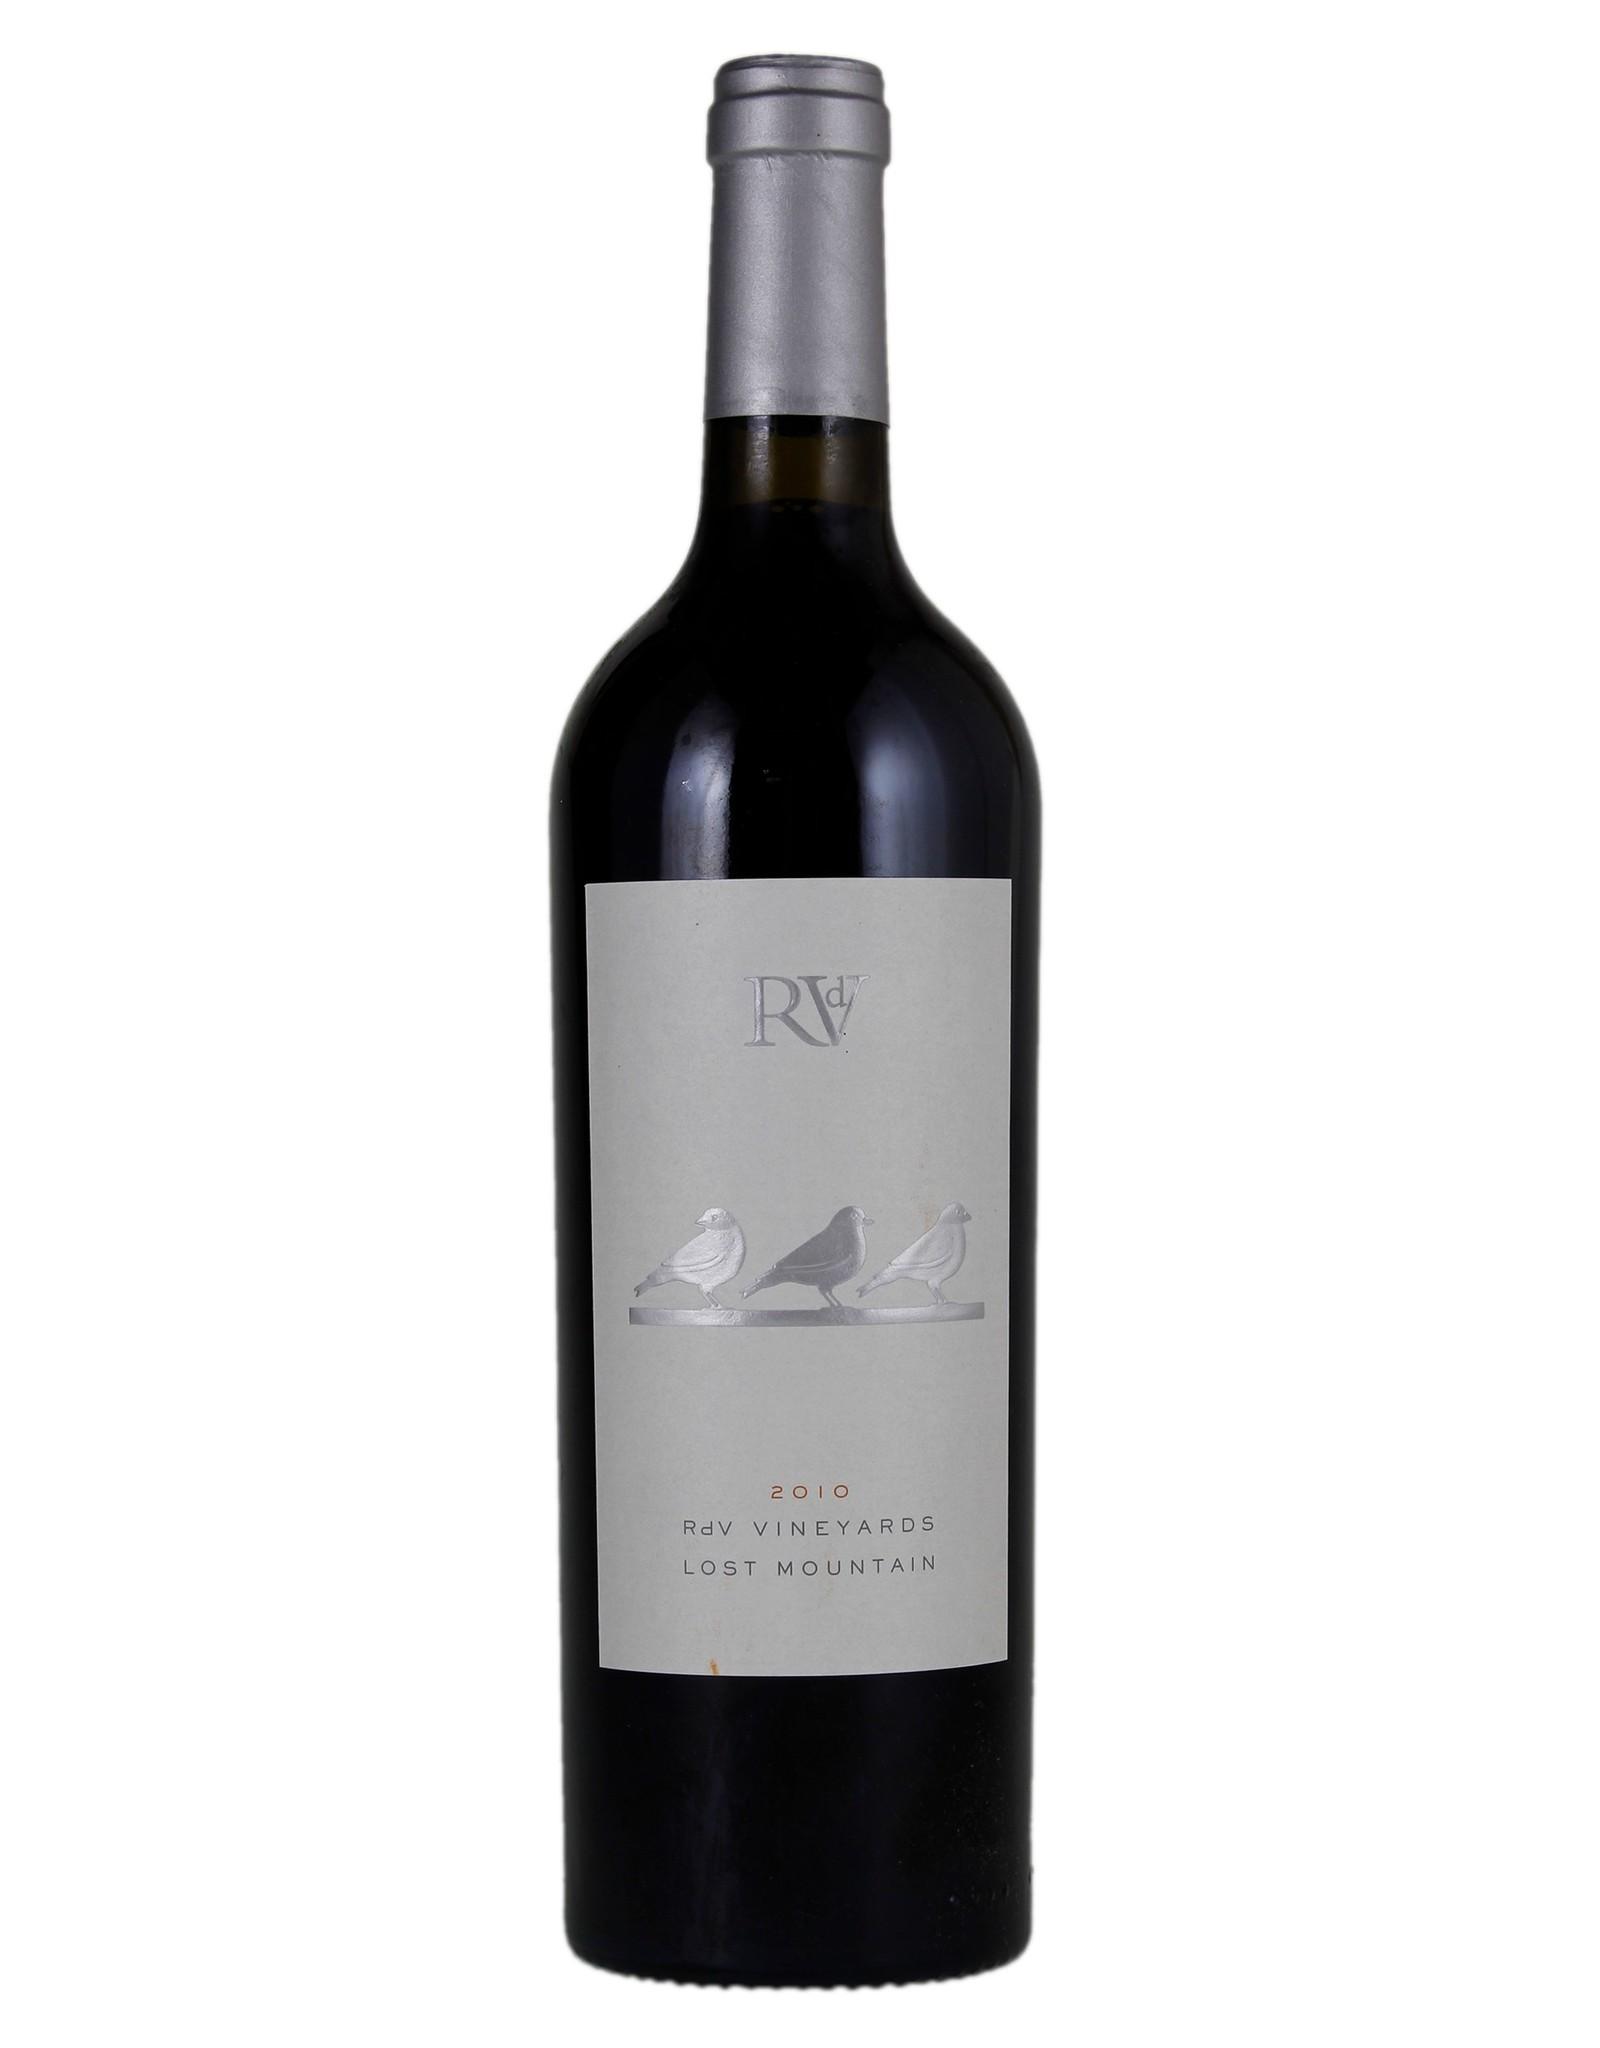 Red Wine 2012, RdV Estates, Cabernet Blend, Lost Mountain, Virginia, USA, 14.5% Alc, CT90, WS92